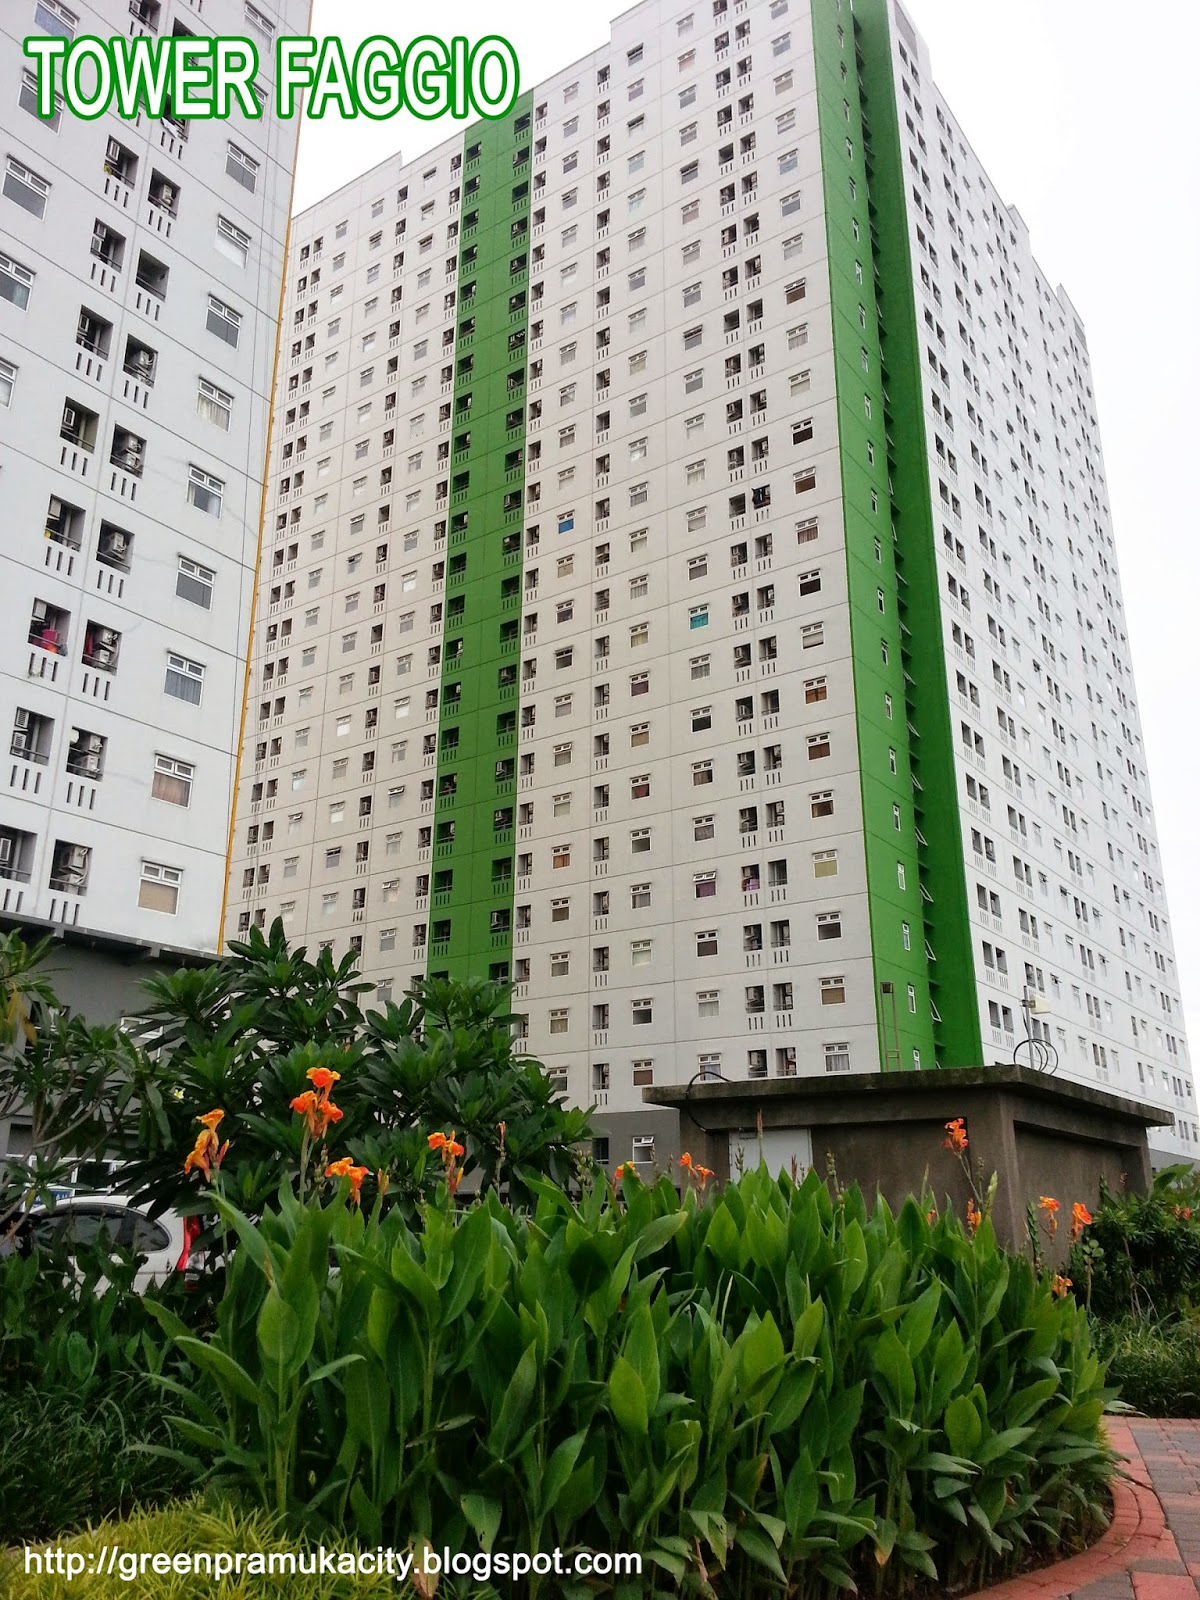 Tower Faggio Green Pramuka City